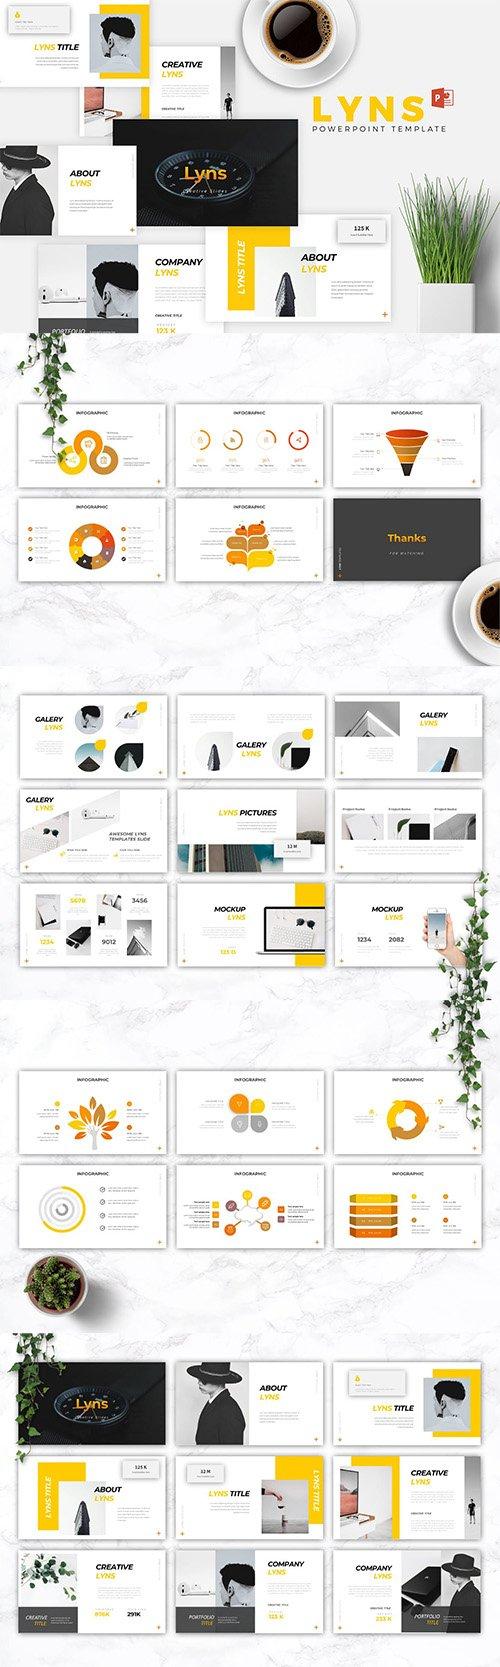 LYNS - Creative Powerpoint, Keynote, Google Slides Templates